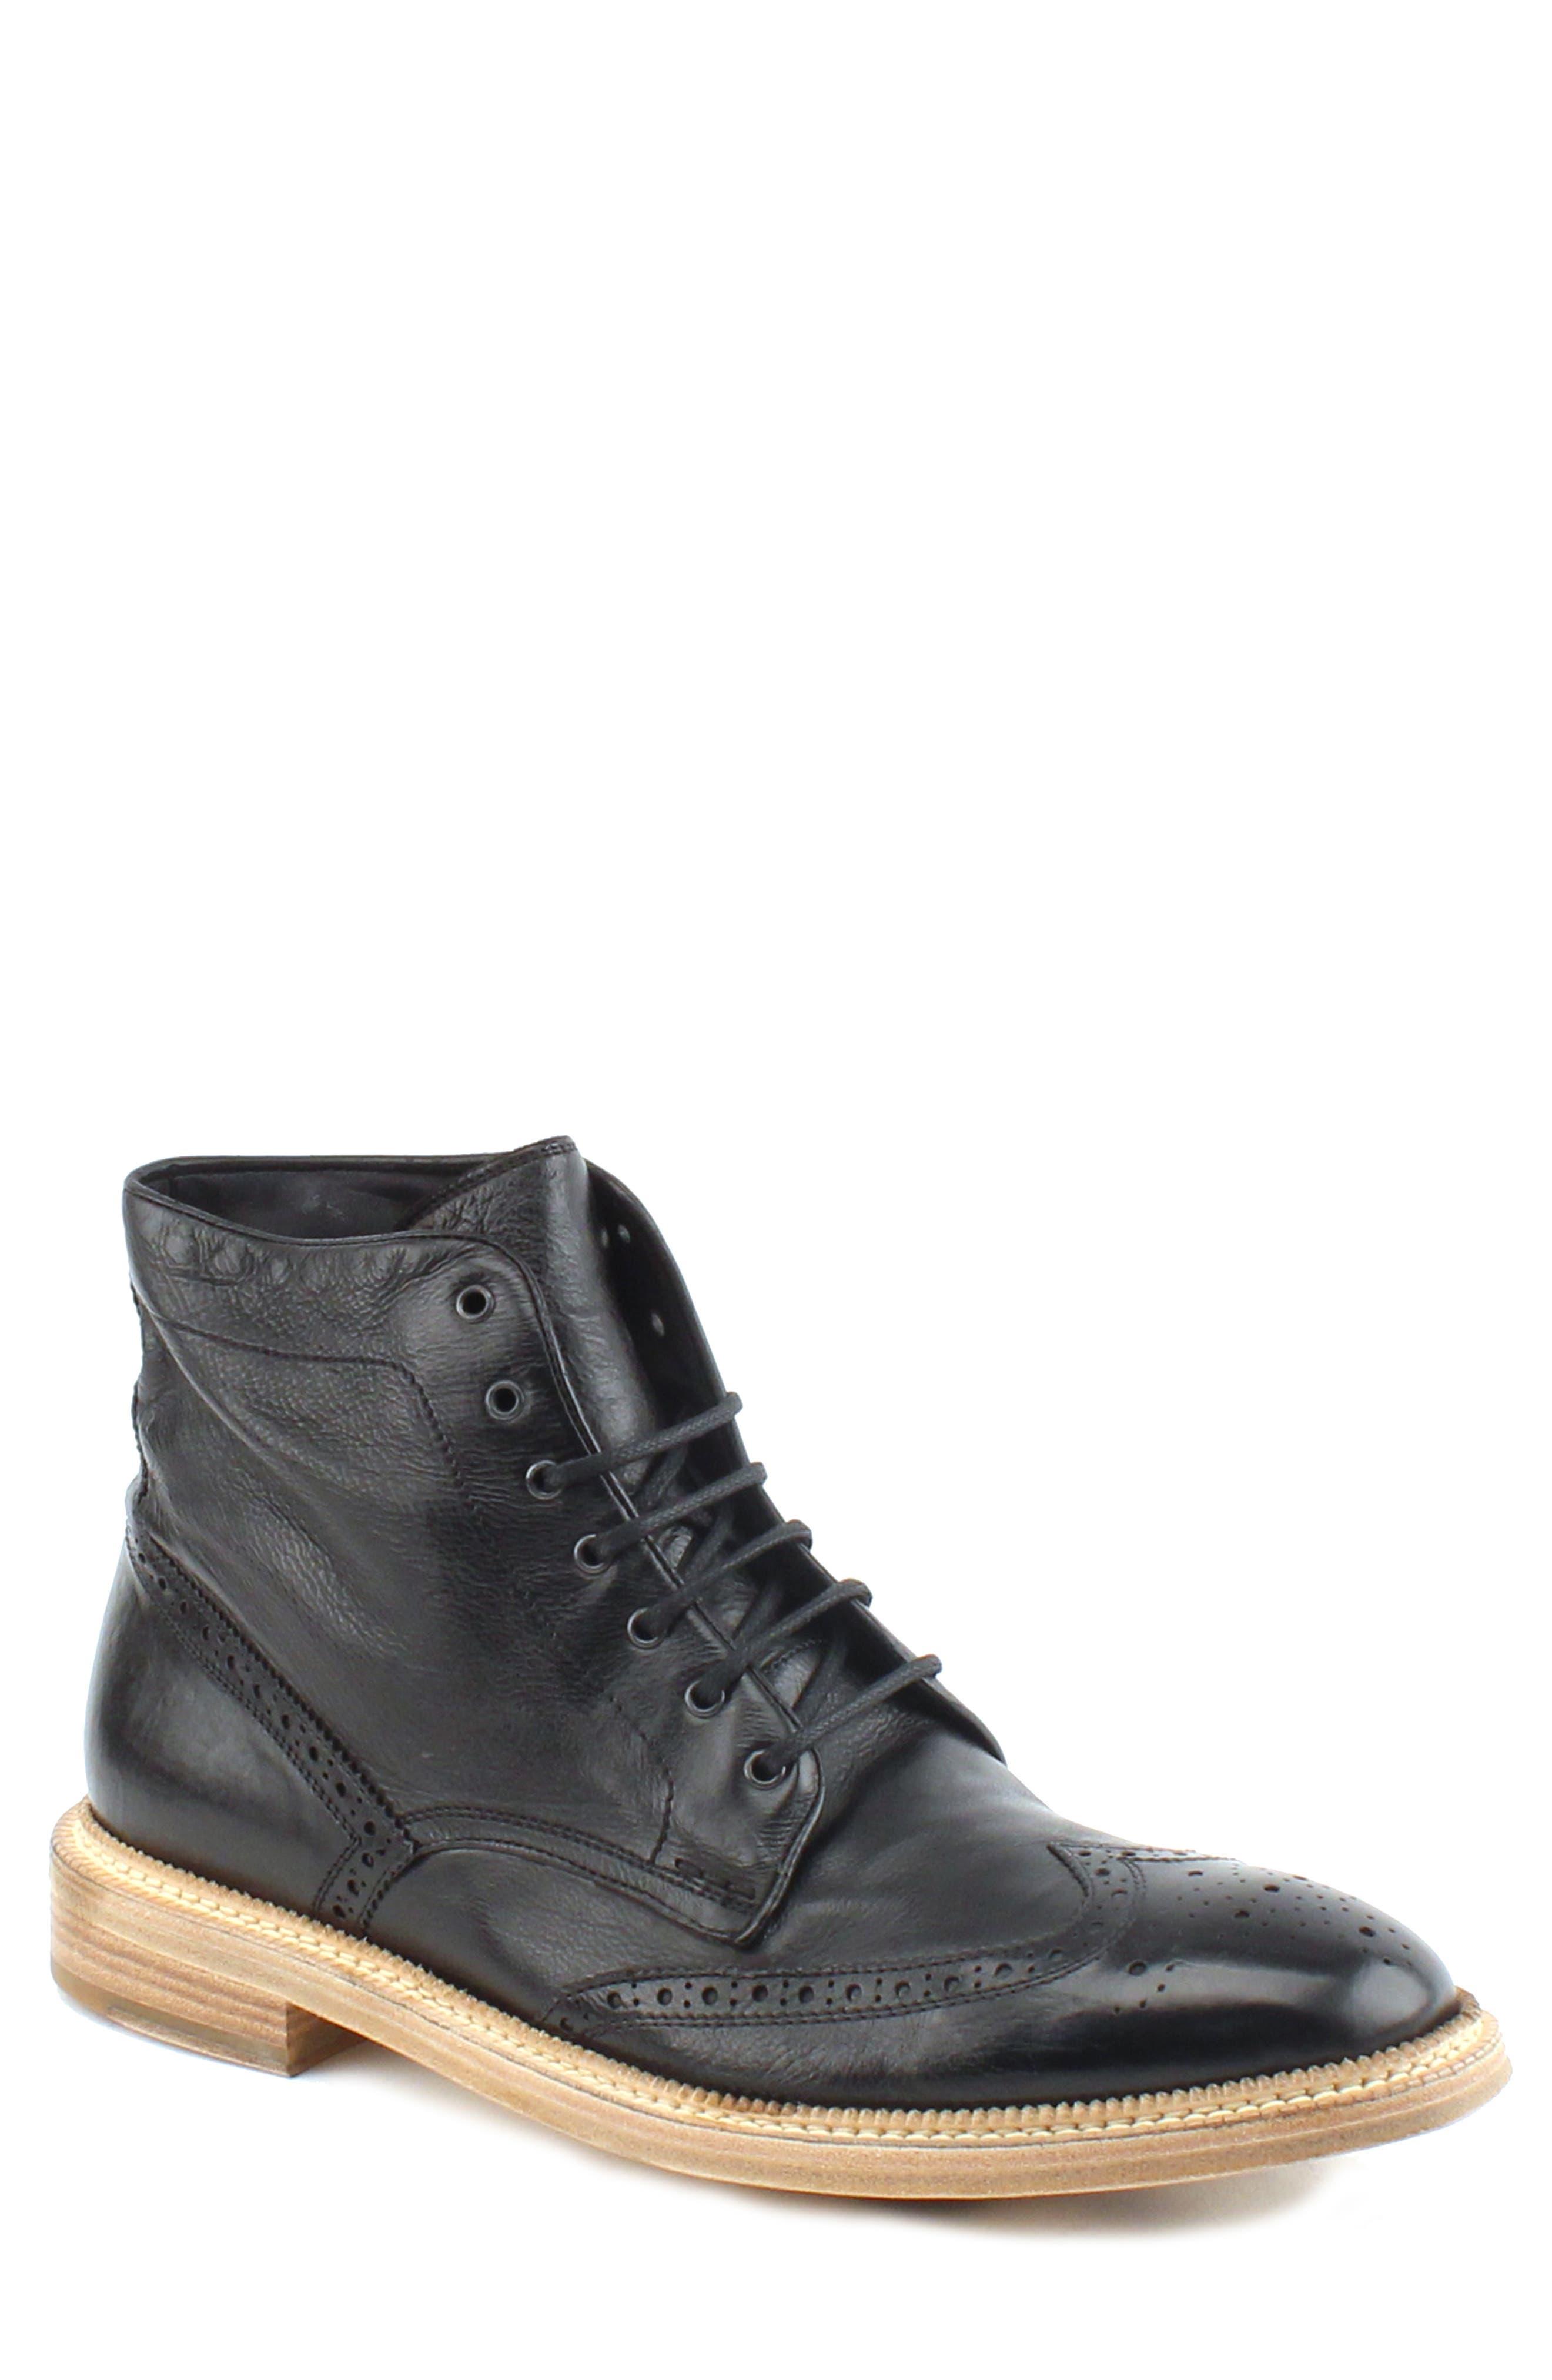 Max Wingtip Boot